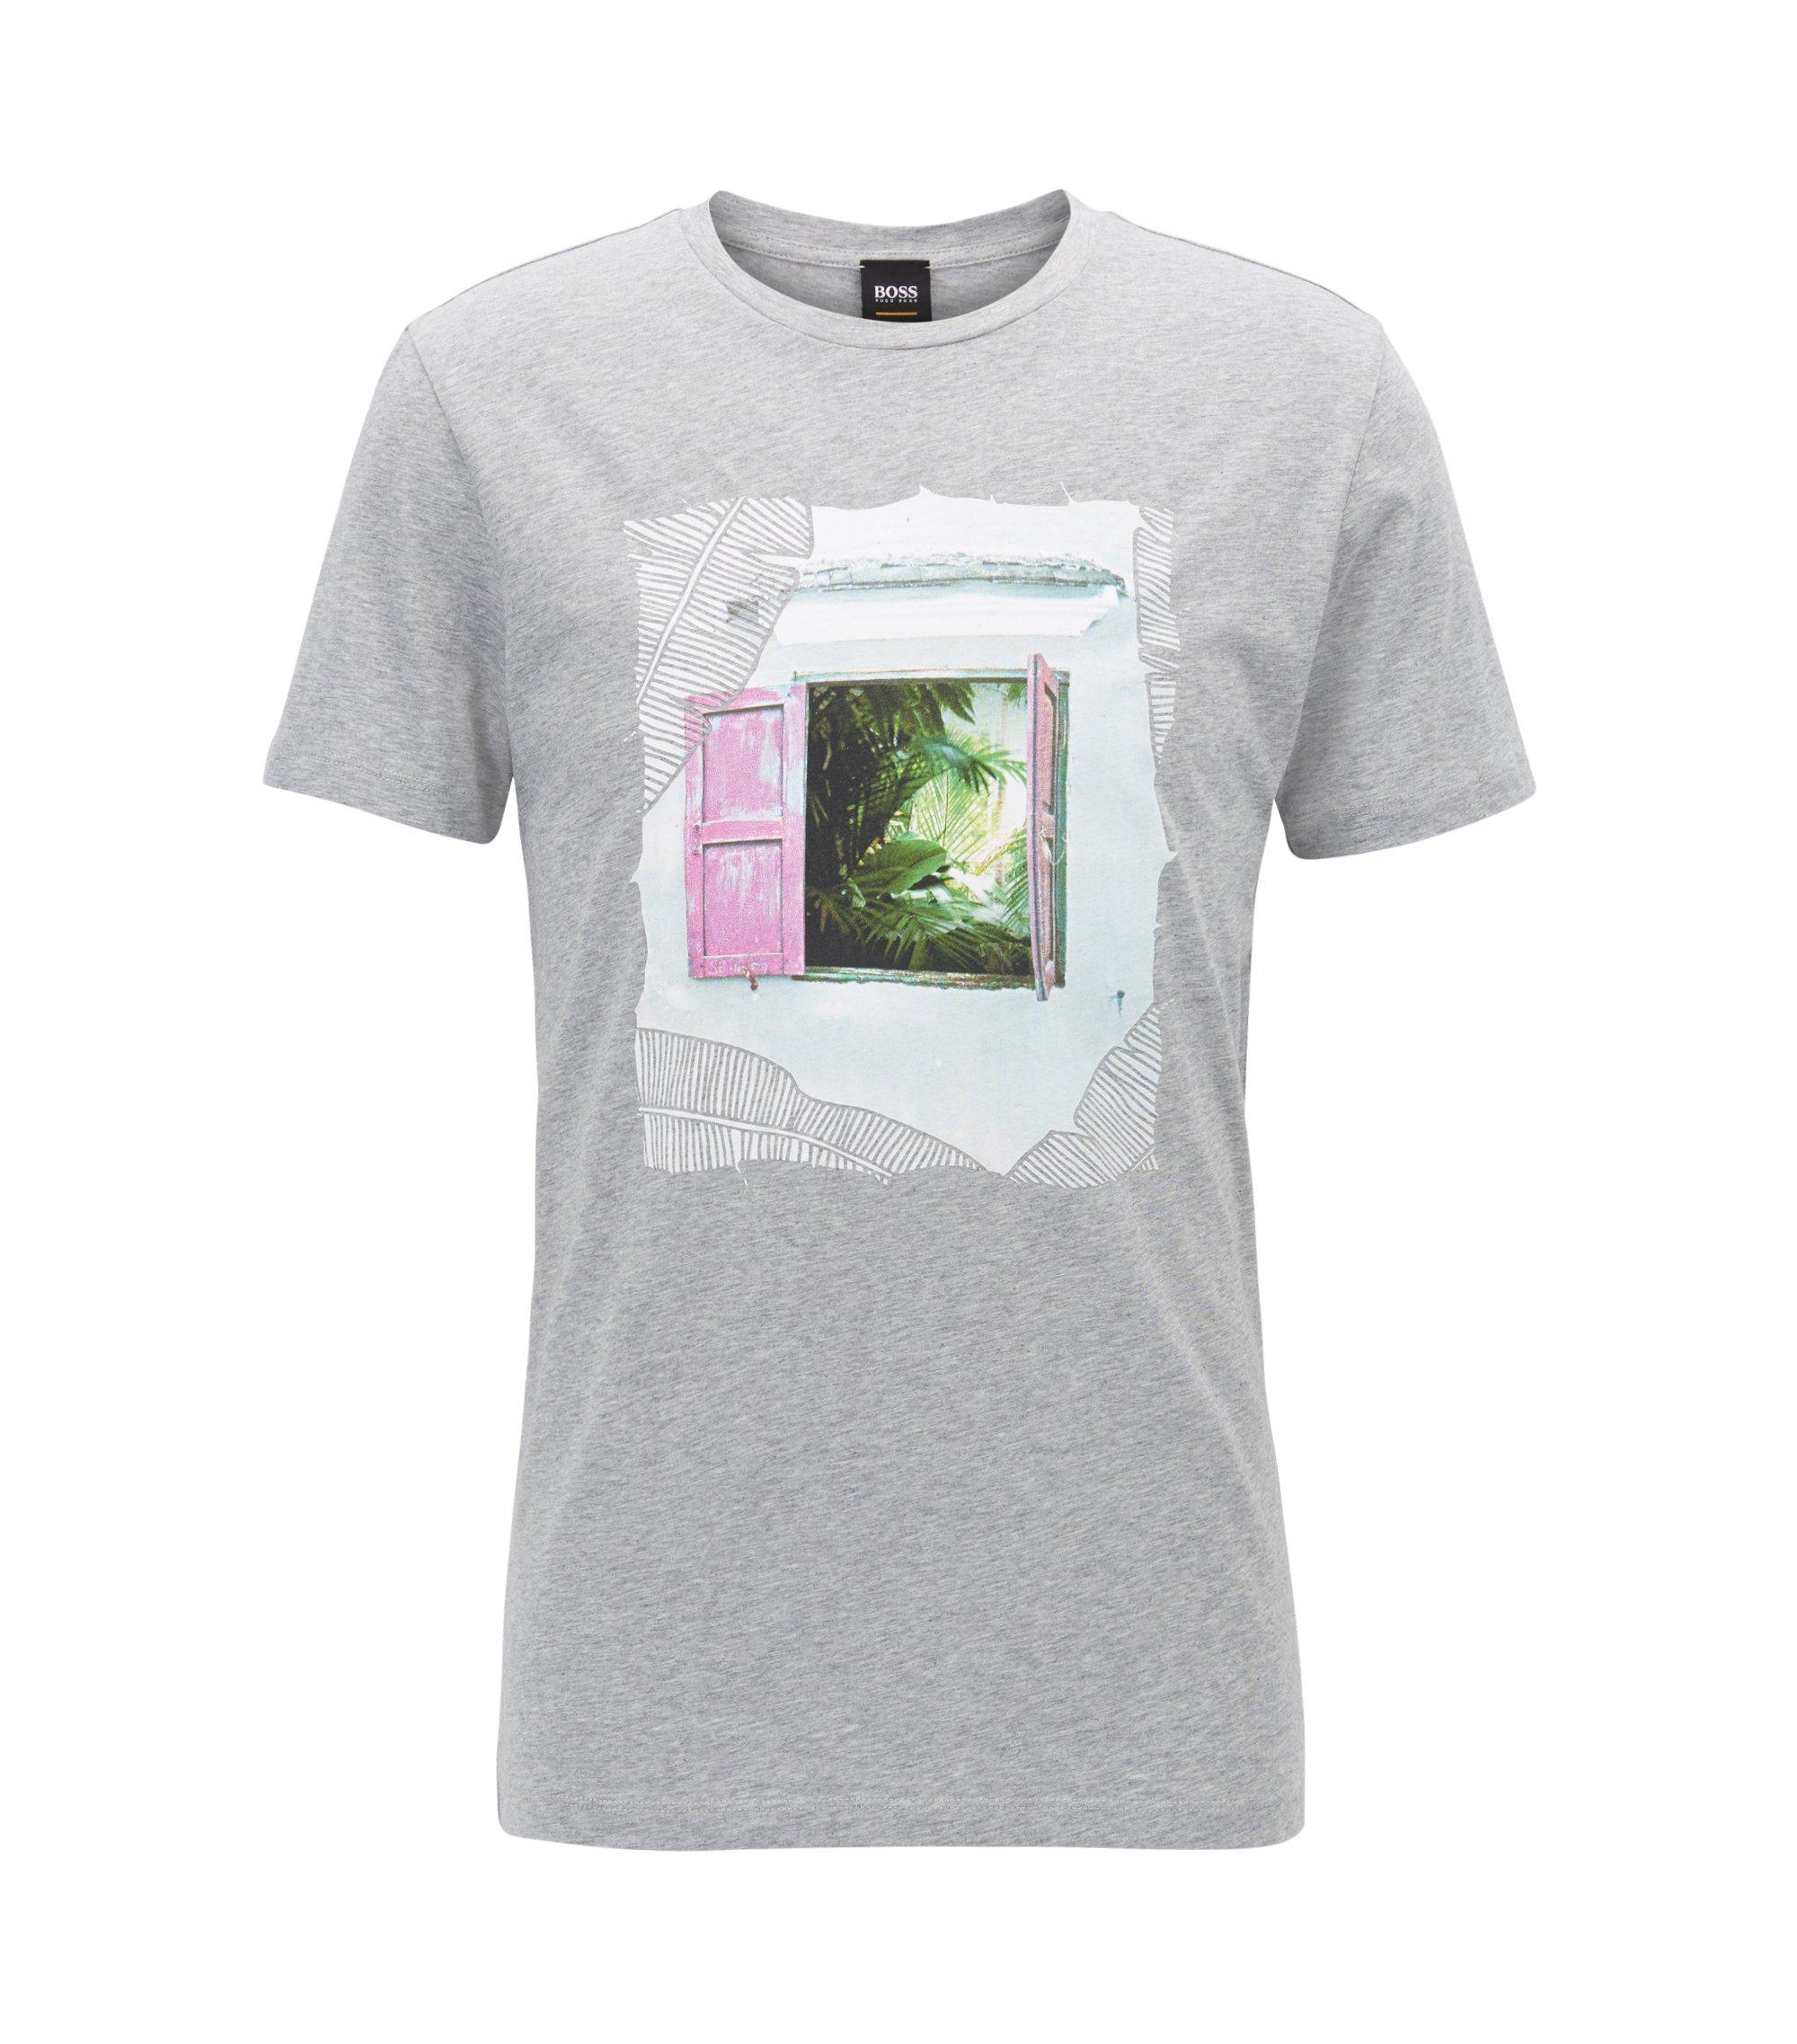 Cuba-Print Cotton Jersey Graphic T-Shirt | Tauno, Grey